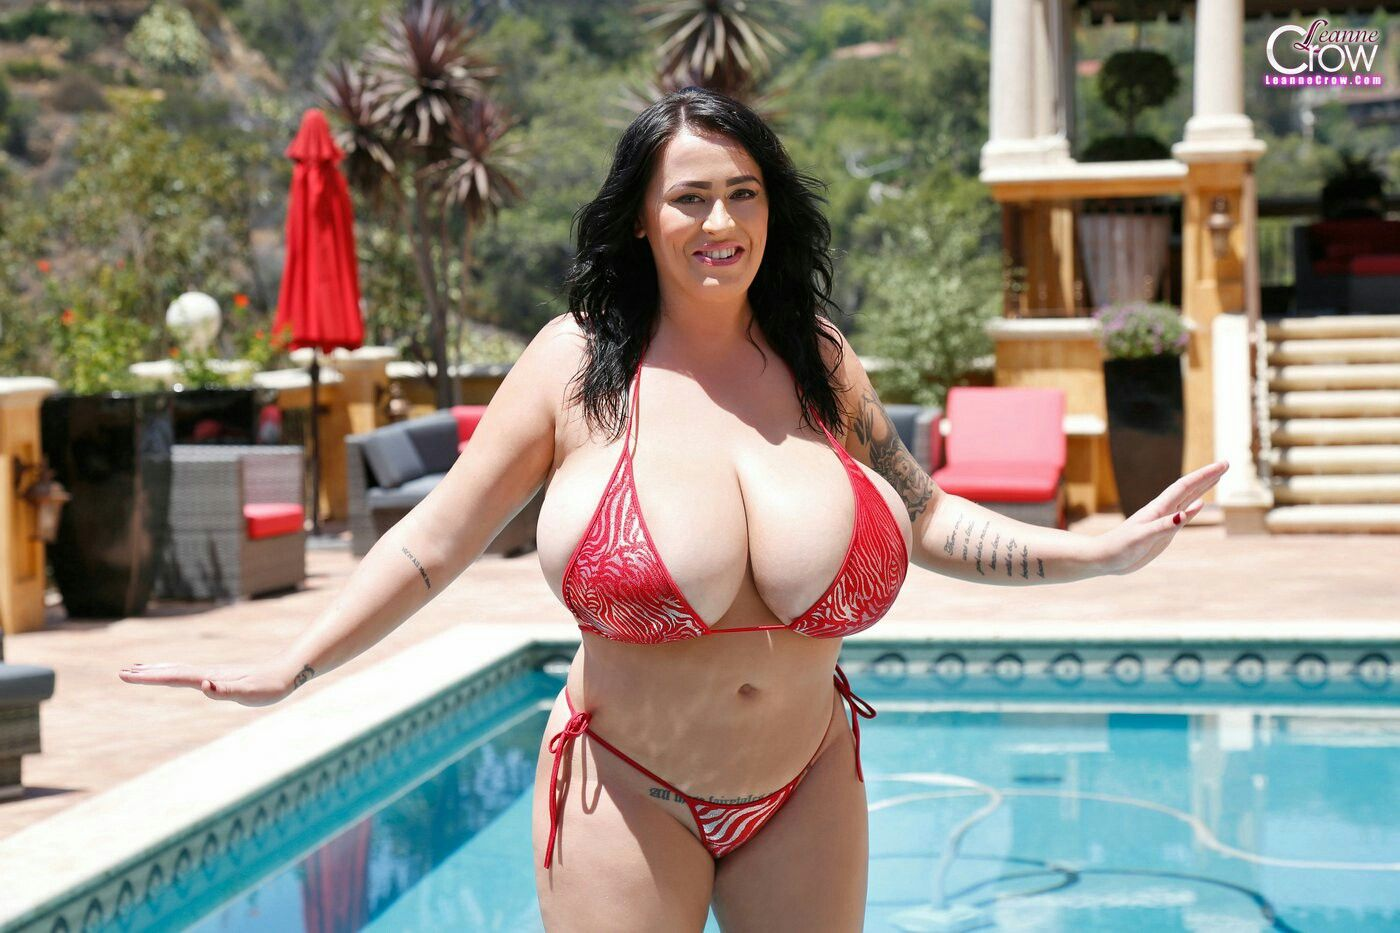 Sarah hyland modern family fake nude